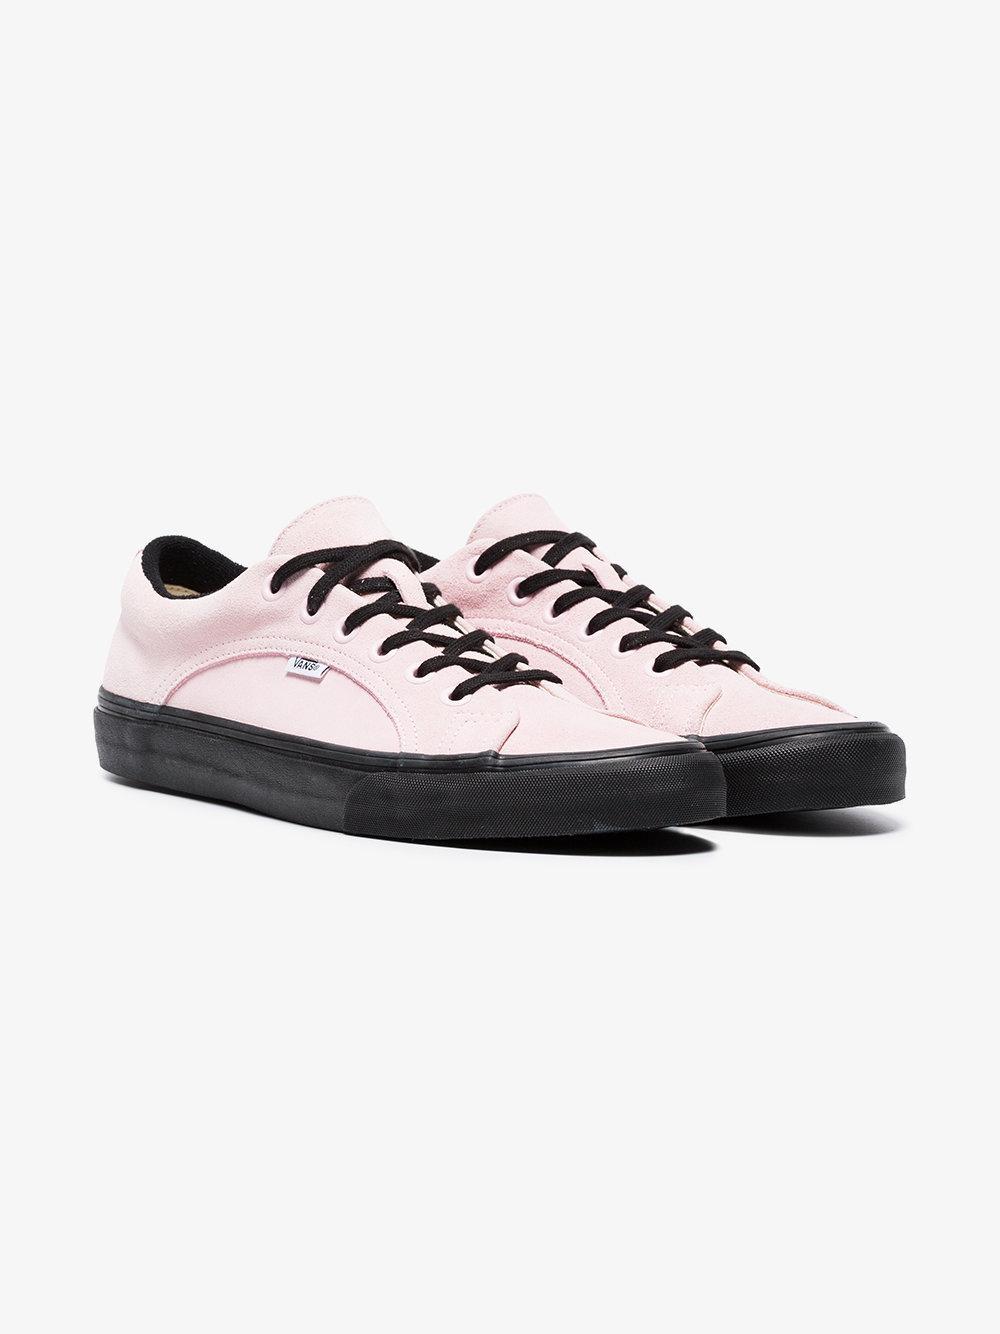 e97dea99e20 Lyst - Vans Lampin Marshmallow Trainers - Mens Uk 7 in Pink for Men